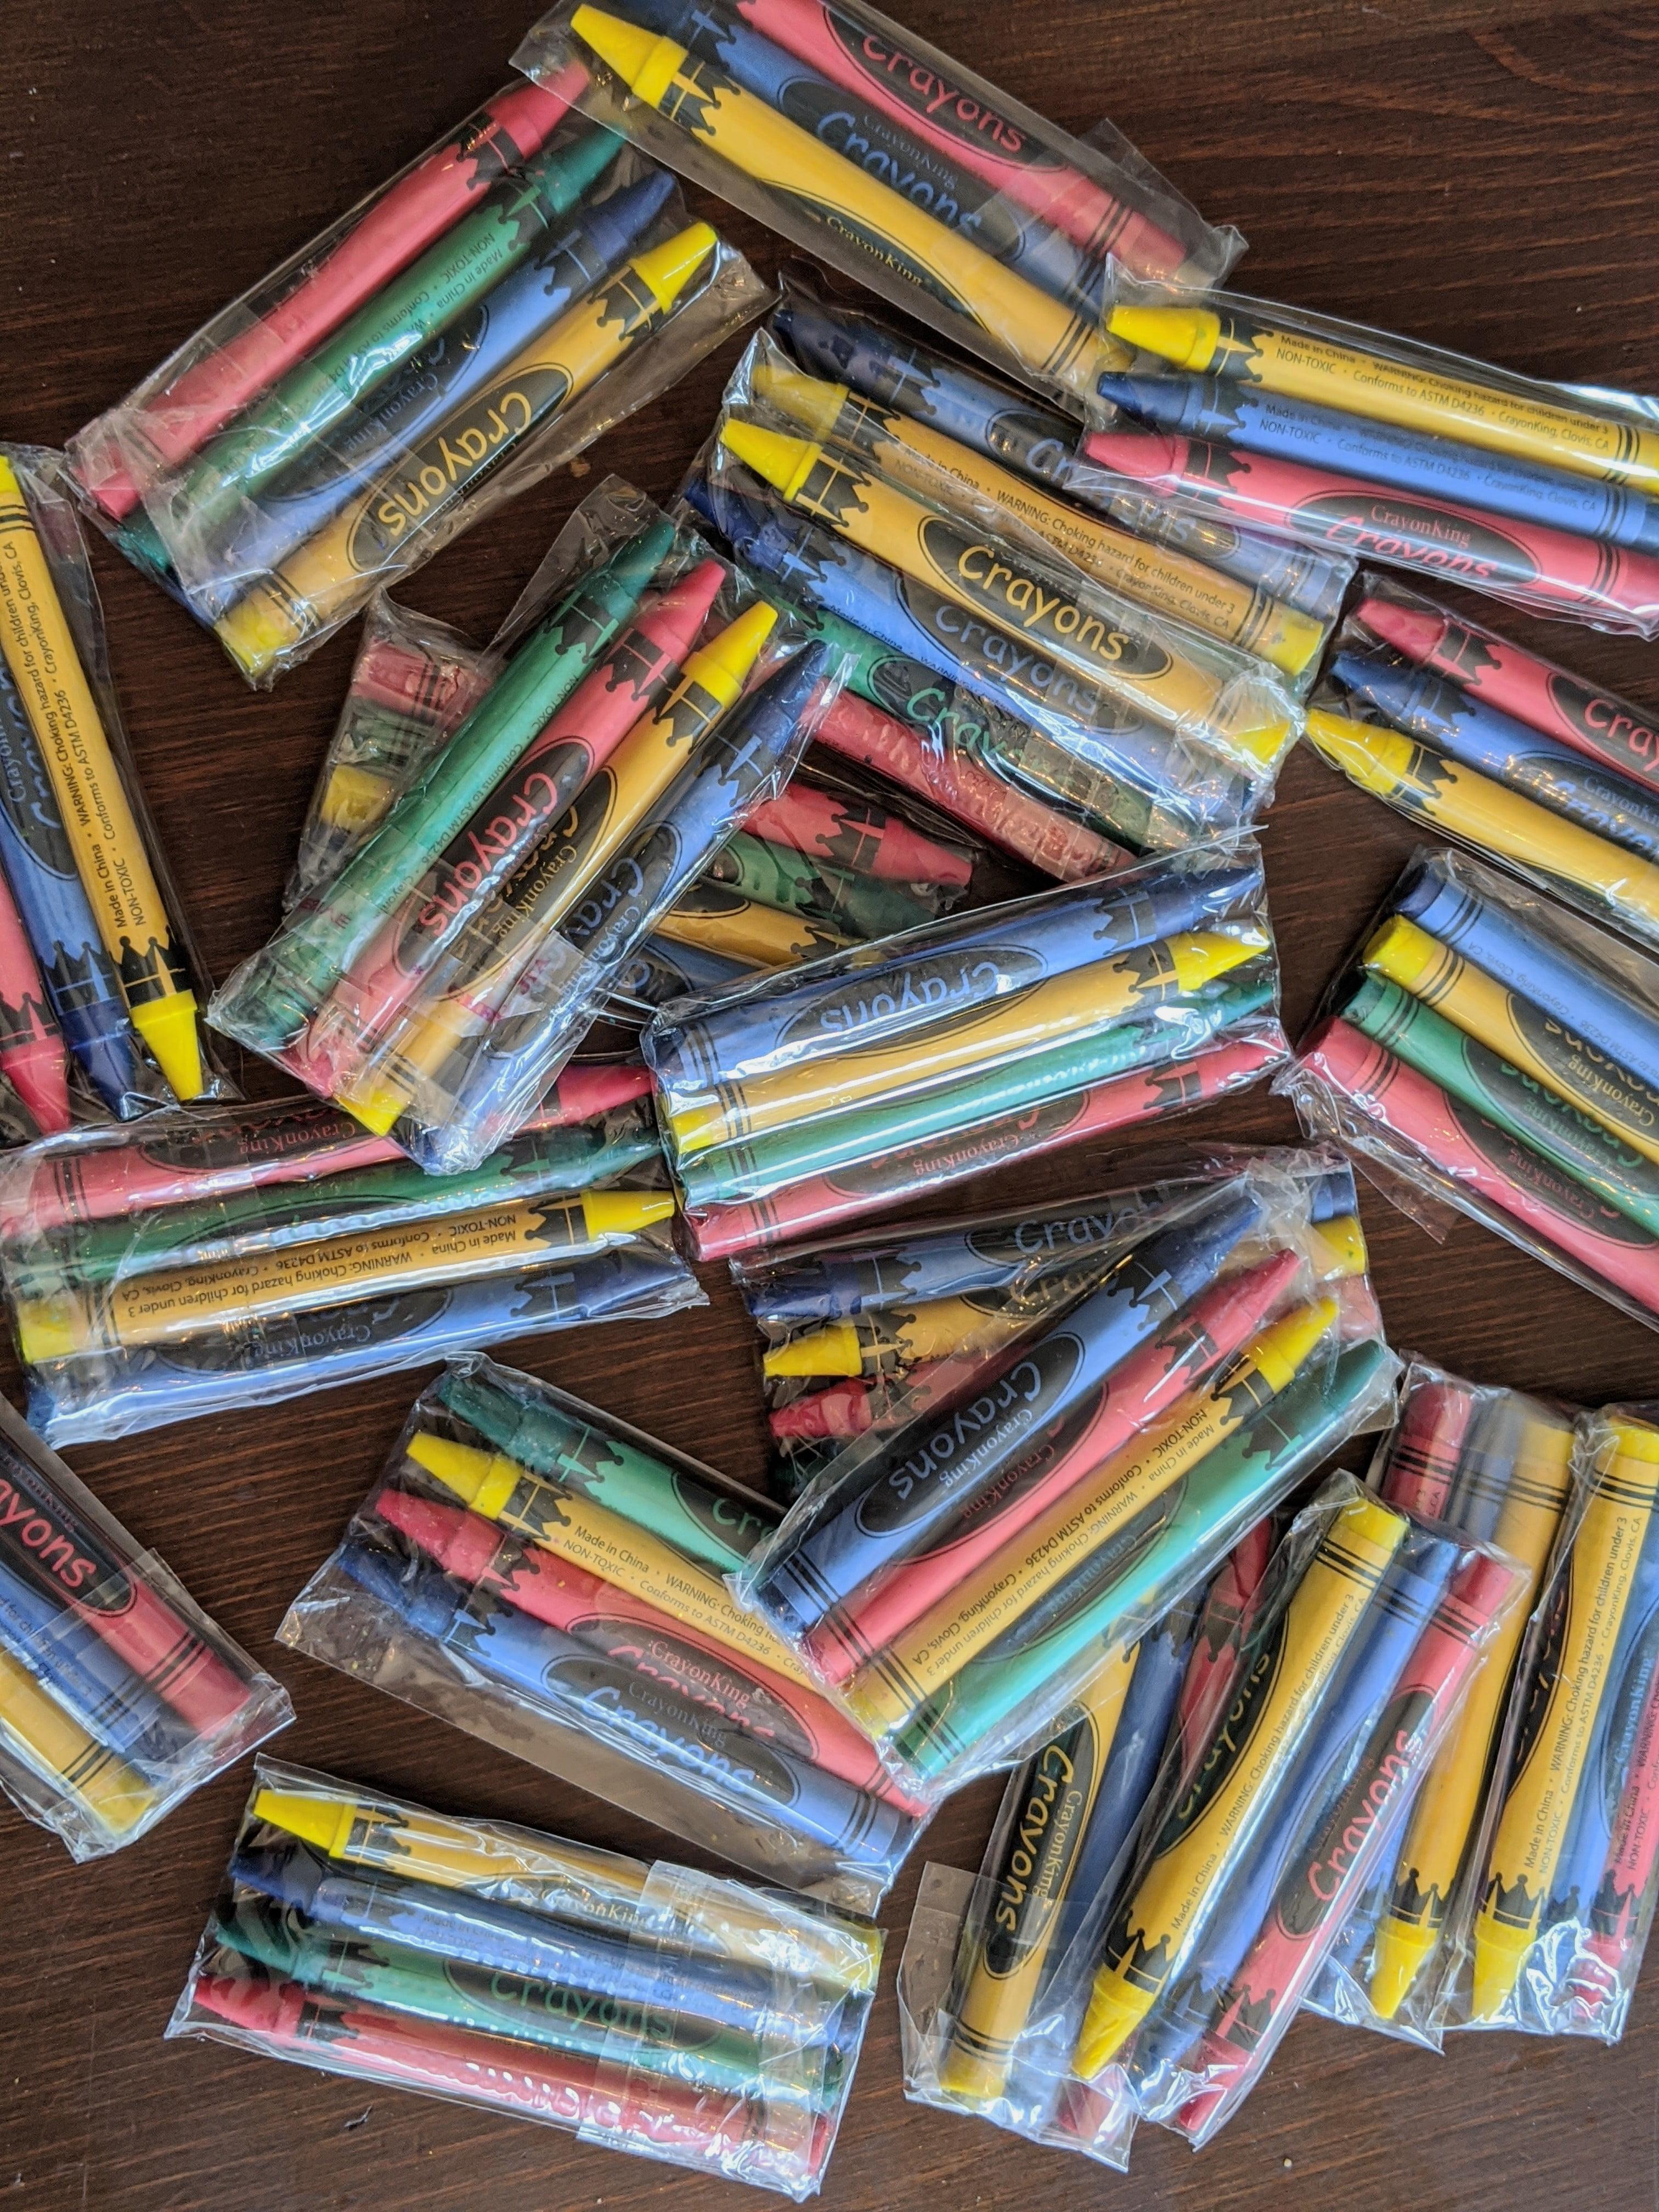 Coloring Crayons CrayonKing 2,000 Bulk Crayons 500 Sets of 4-Packs in Cello